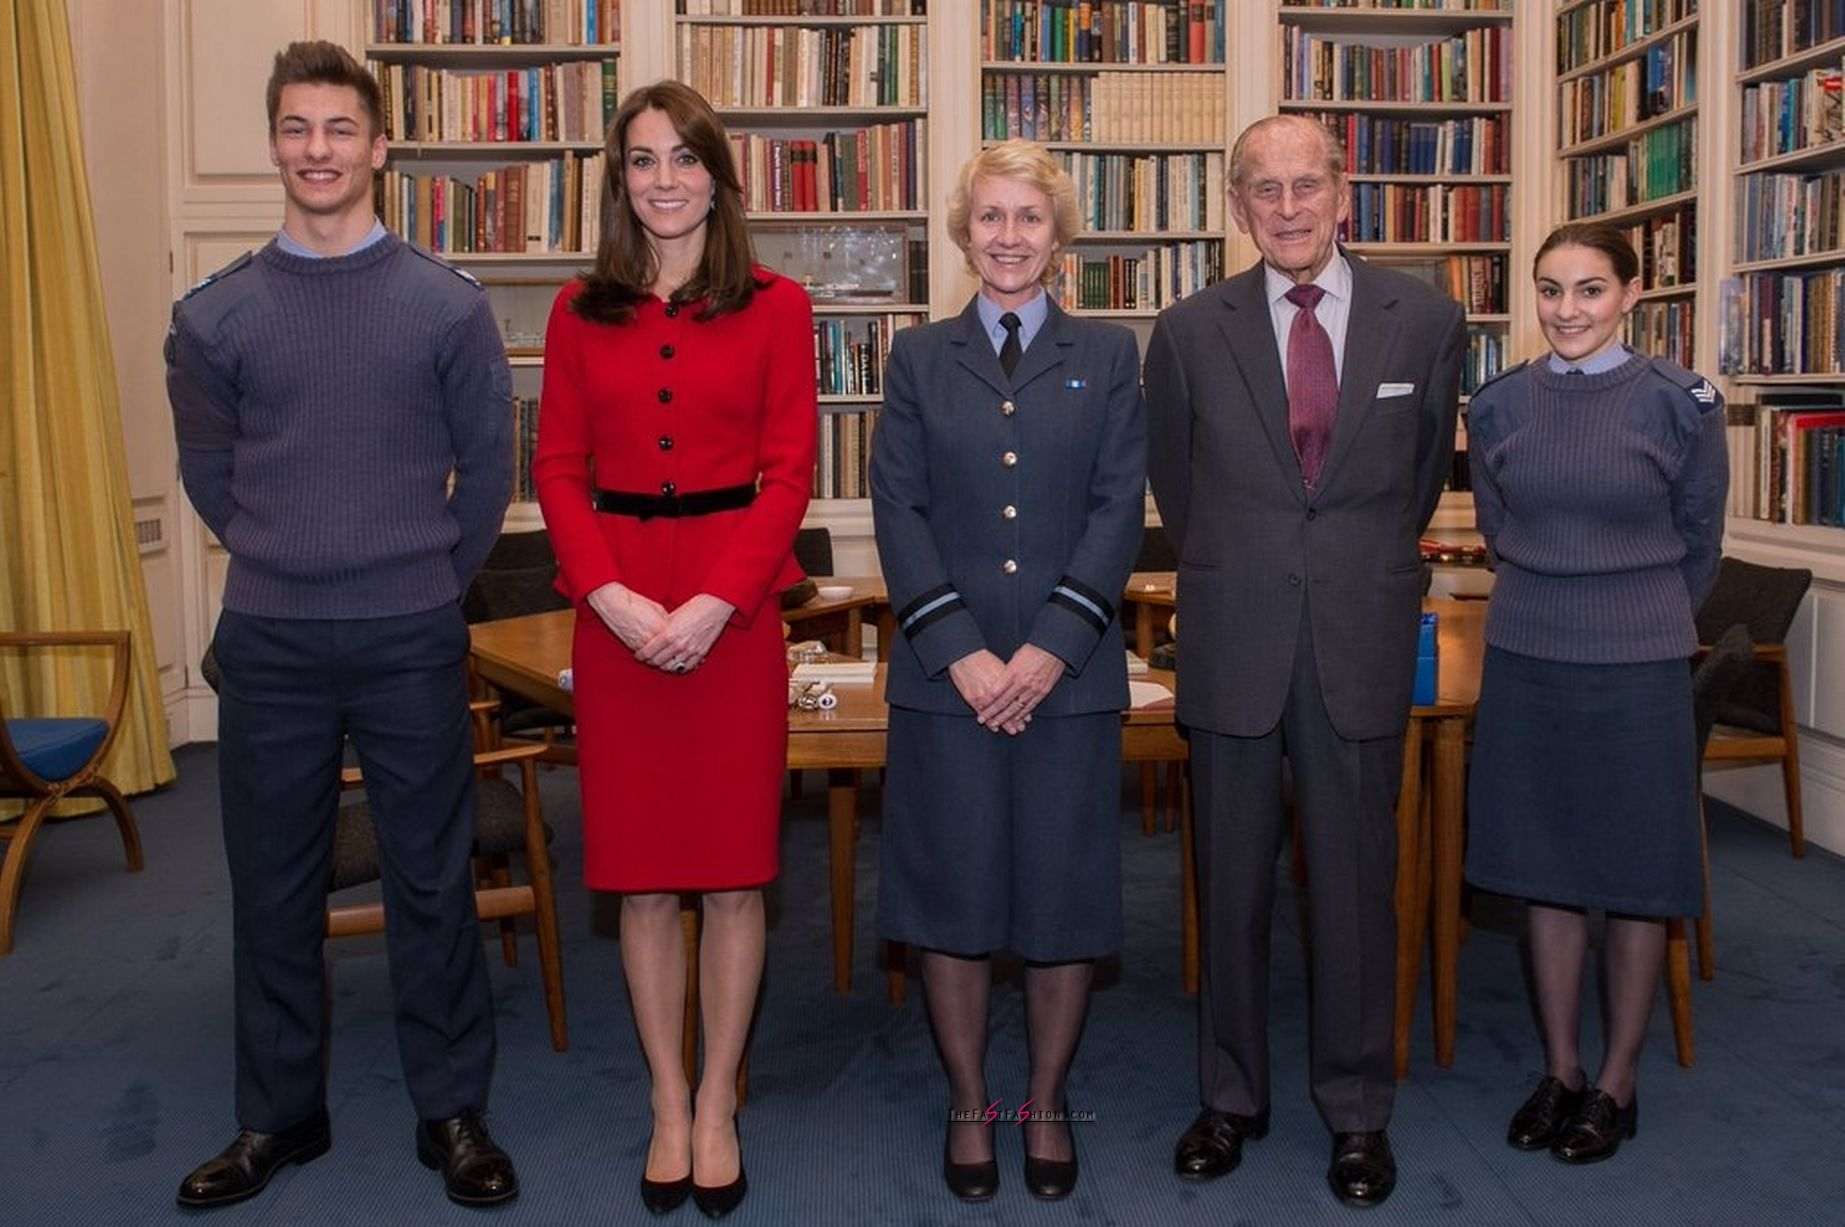 Welcome-HRH-The-Duchess-of-Cambridge-and-thank-you-HRH-The-Duke-of-Edinburgh